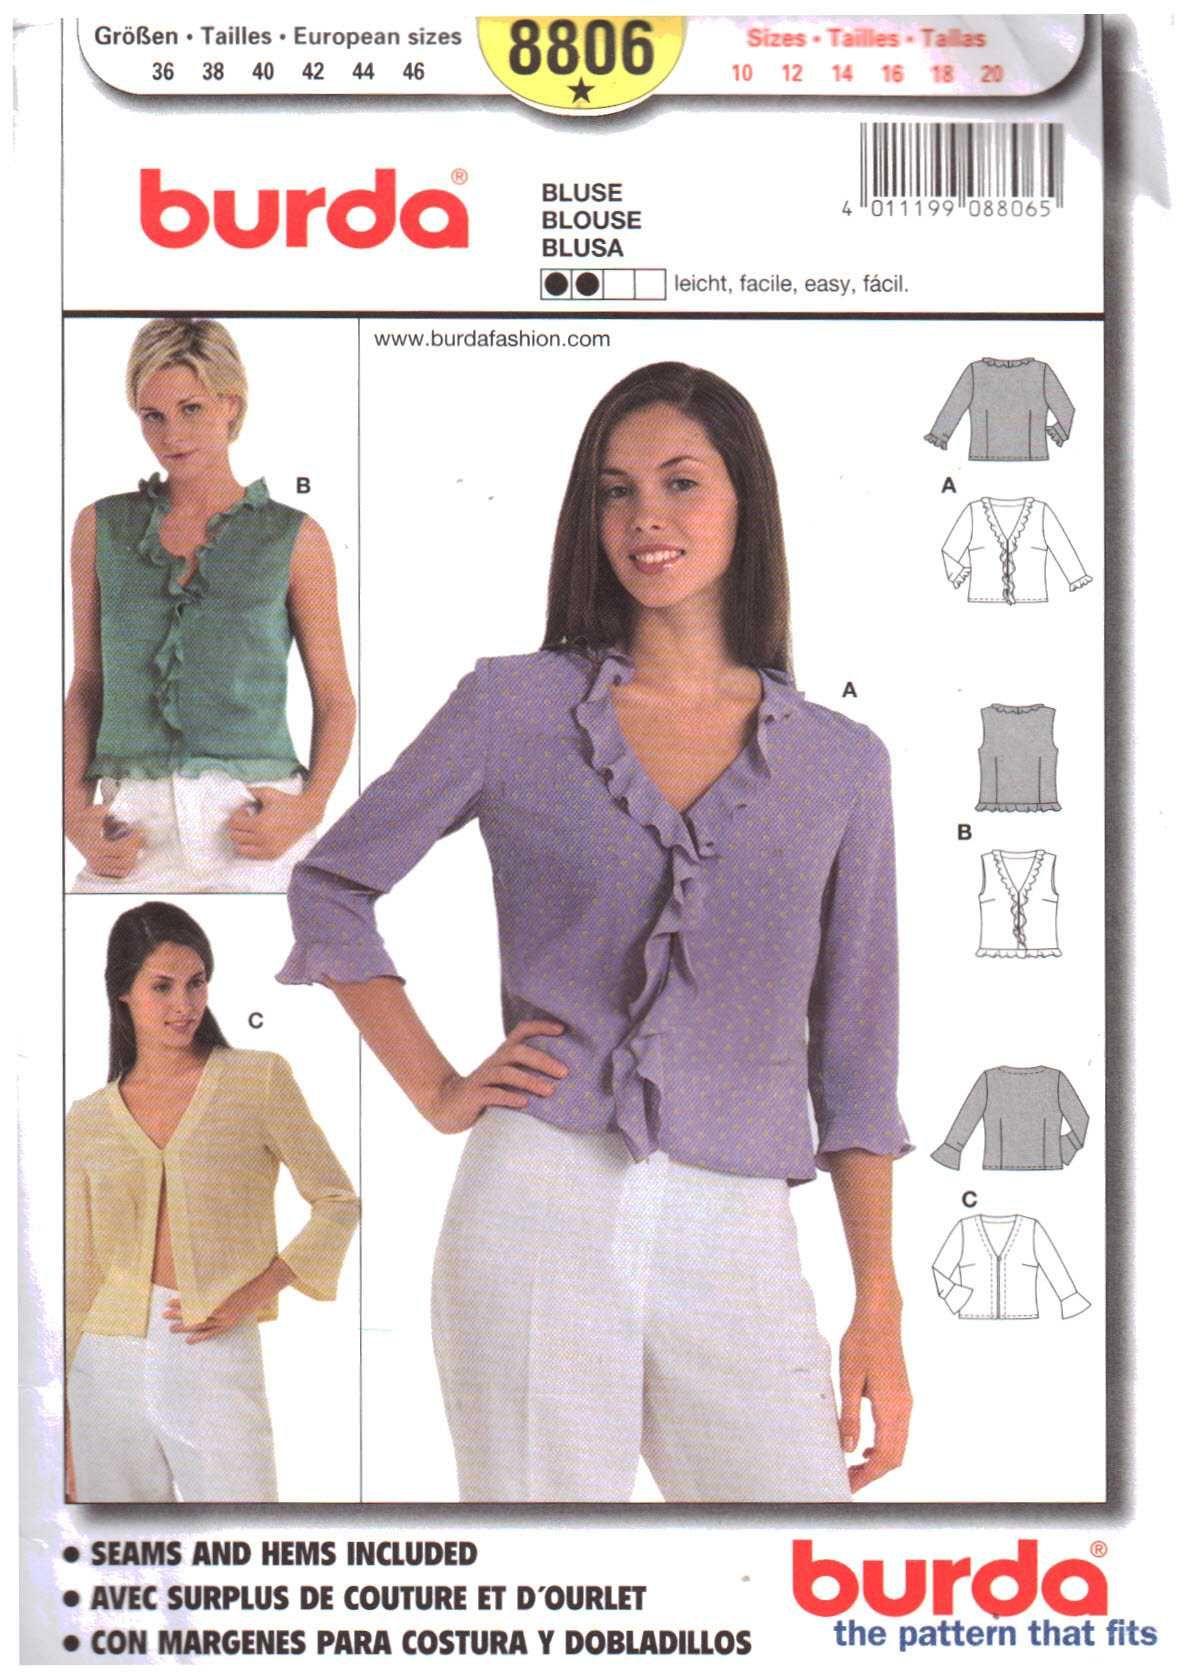 Burda 8806 Blouse Size: 10-12-14-16-18-20 Uncut   Newest Sewing ...